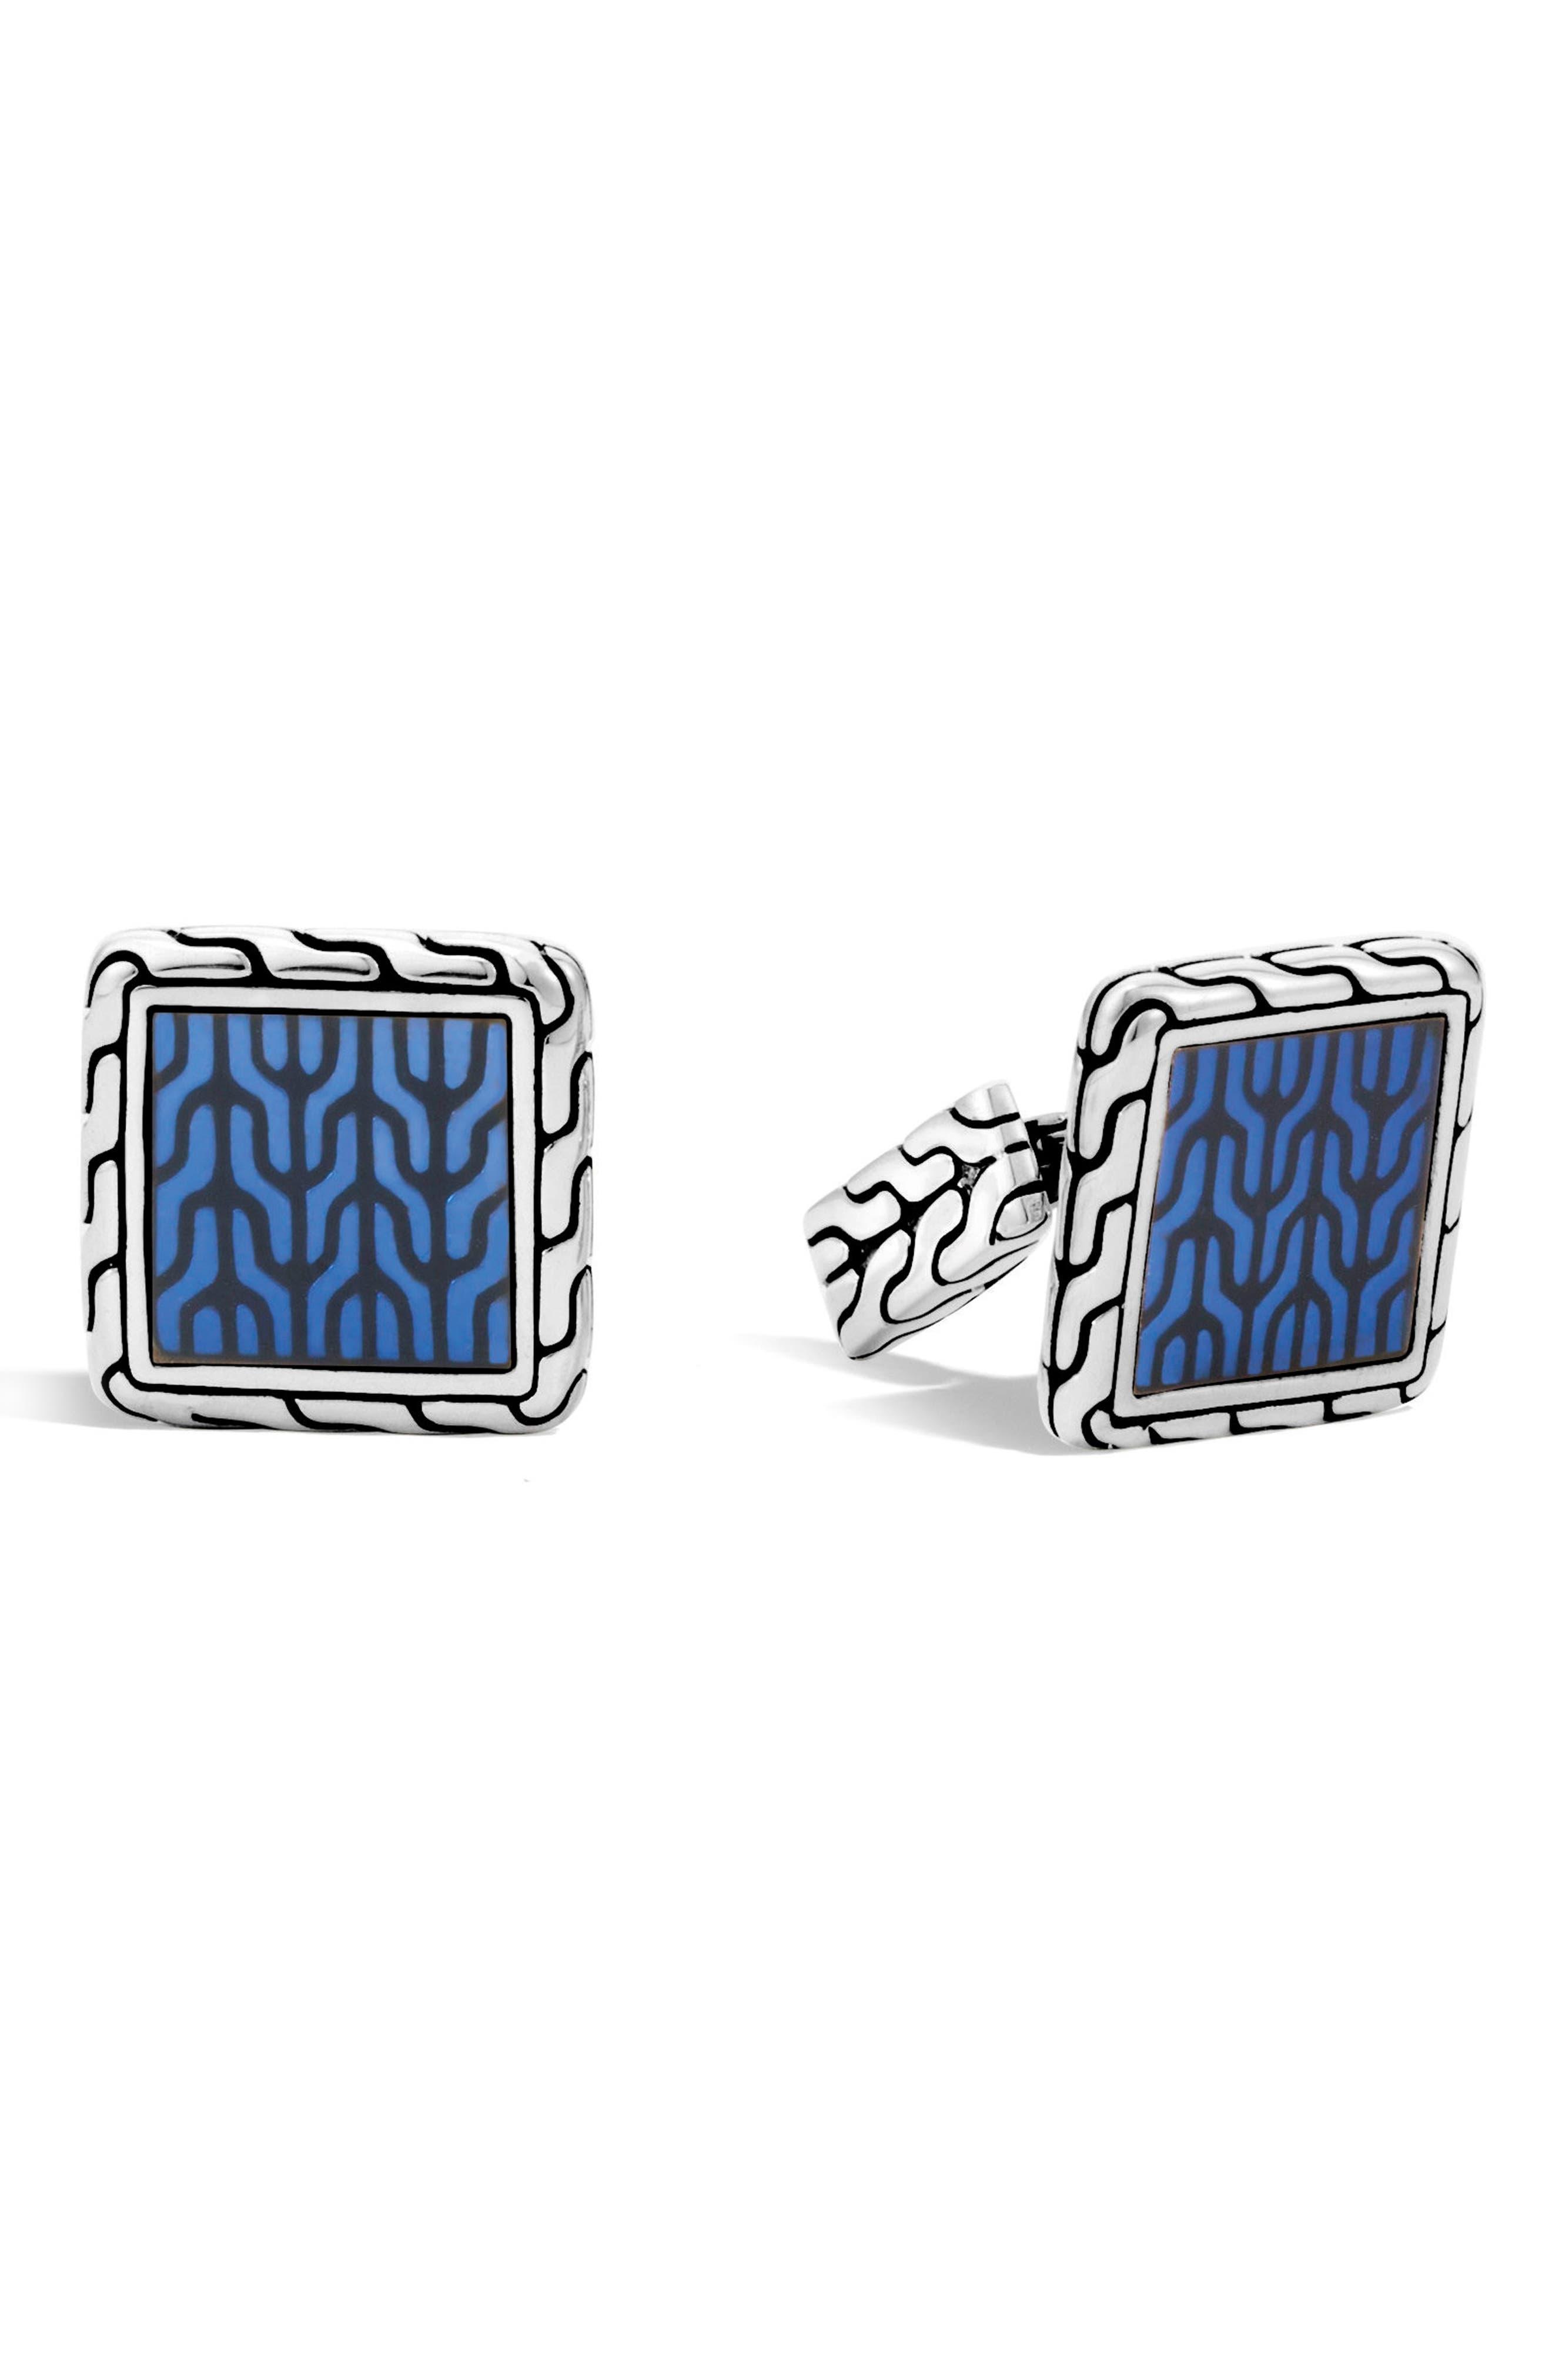 JOHN HARDY,                             Classic Chain Silver Enamel Square Cuff Links,                             Main thumbnail 1, color,                             SILVER/ BLUE